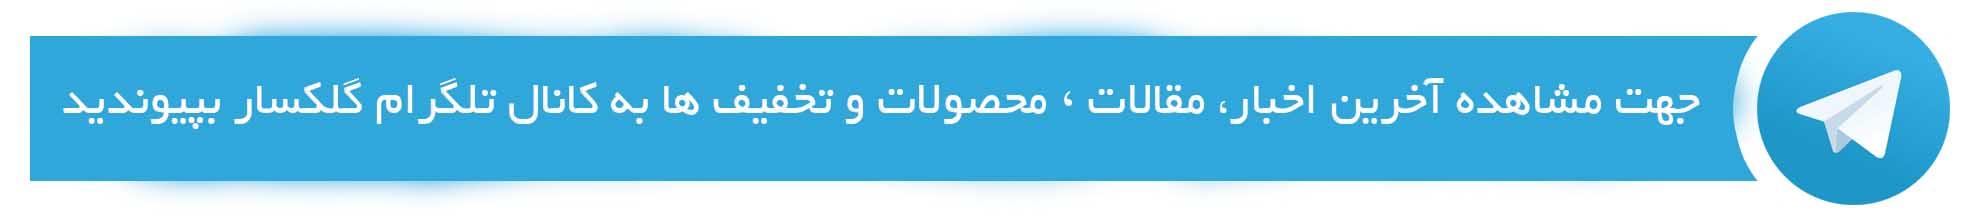 کانال تلگرام فلزیاب گلکسار